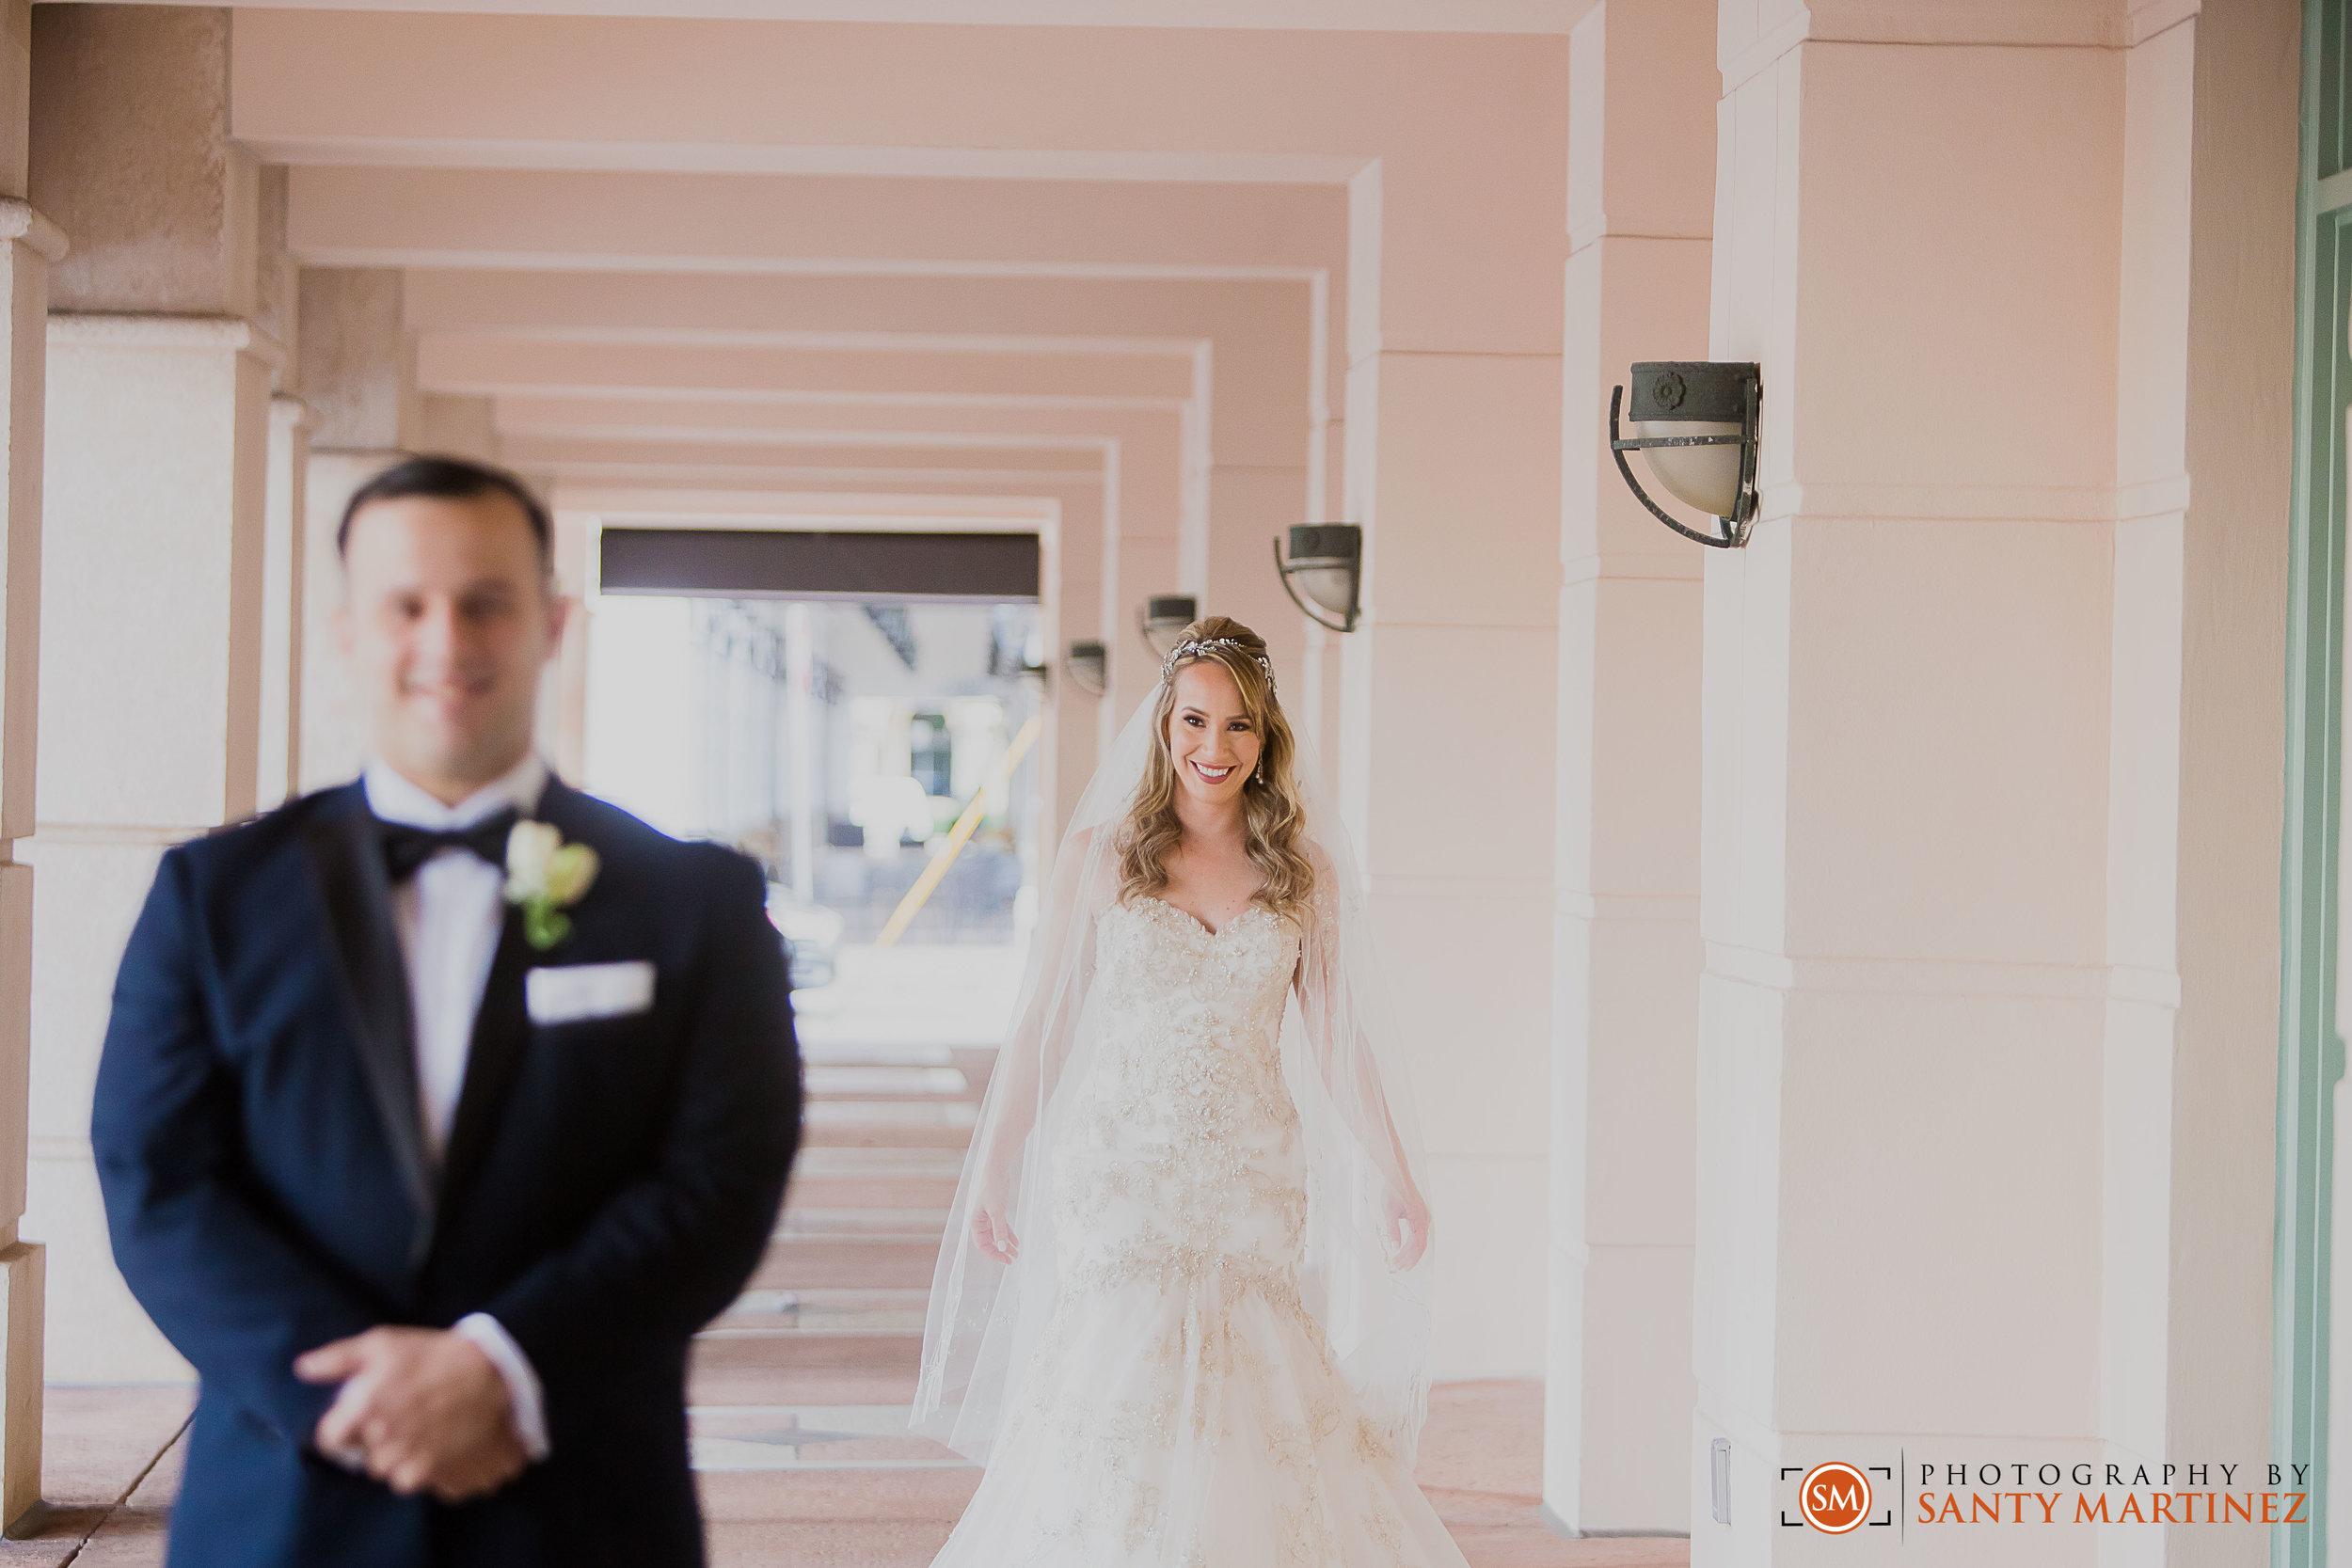 Wedding La Jolla Ballroom - Photography by Santy Martinez-14.jpg